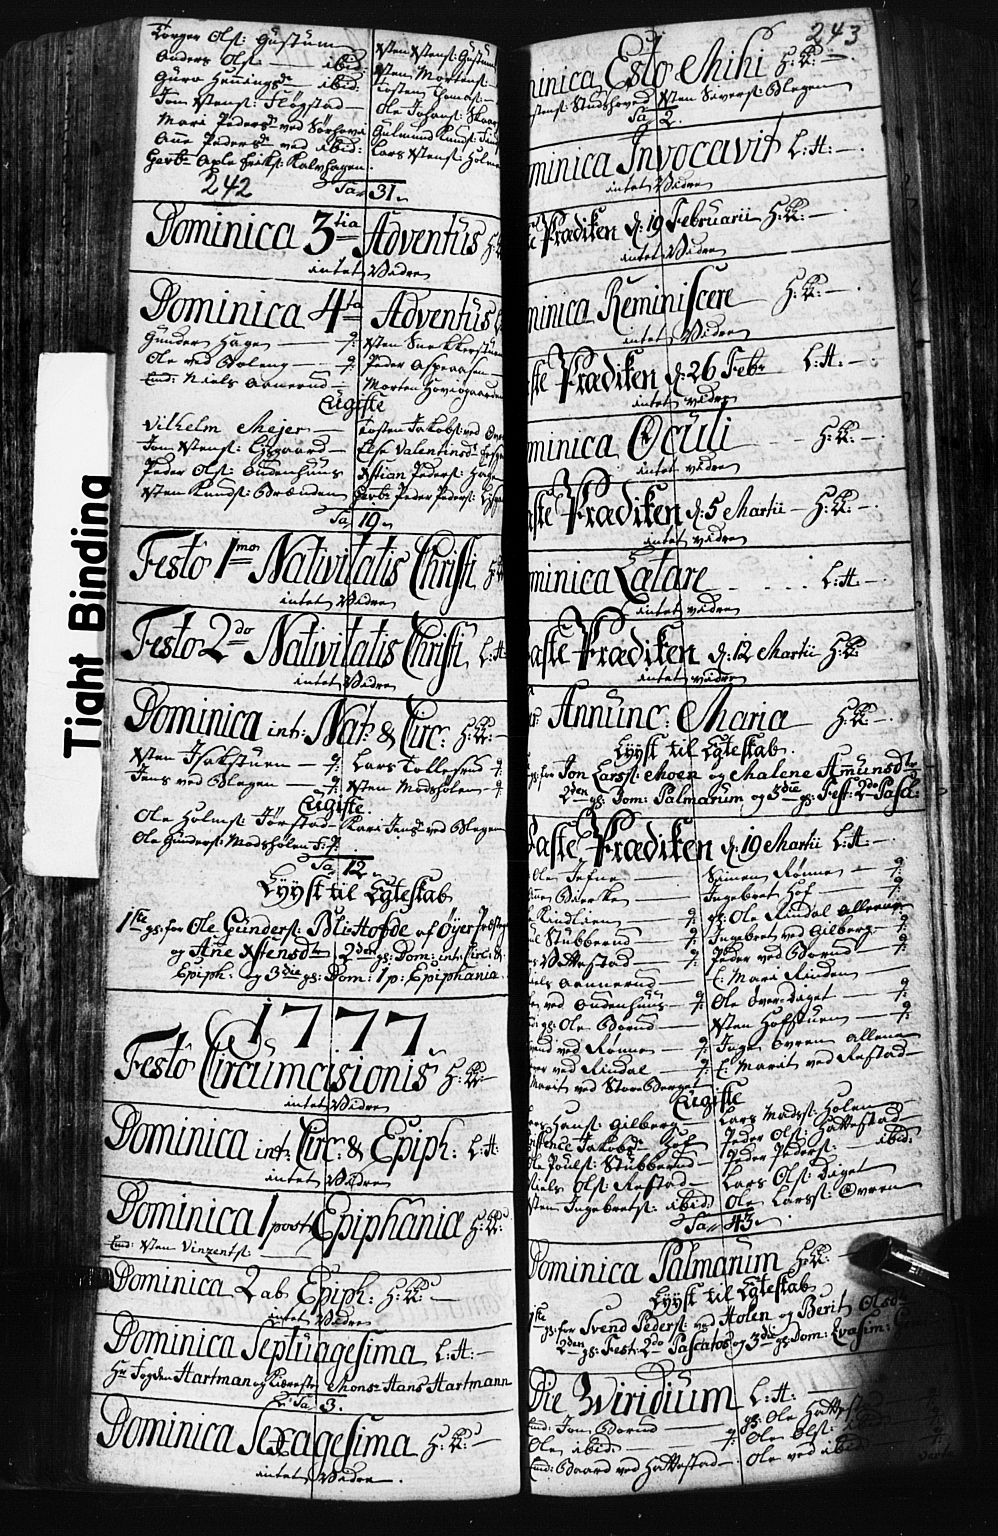 SAH, Fåberg prestekontor, Klokkerbok nr. 3, 1768-1796, s. 242-243